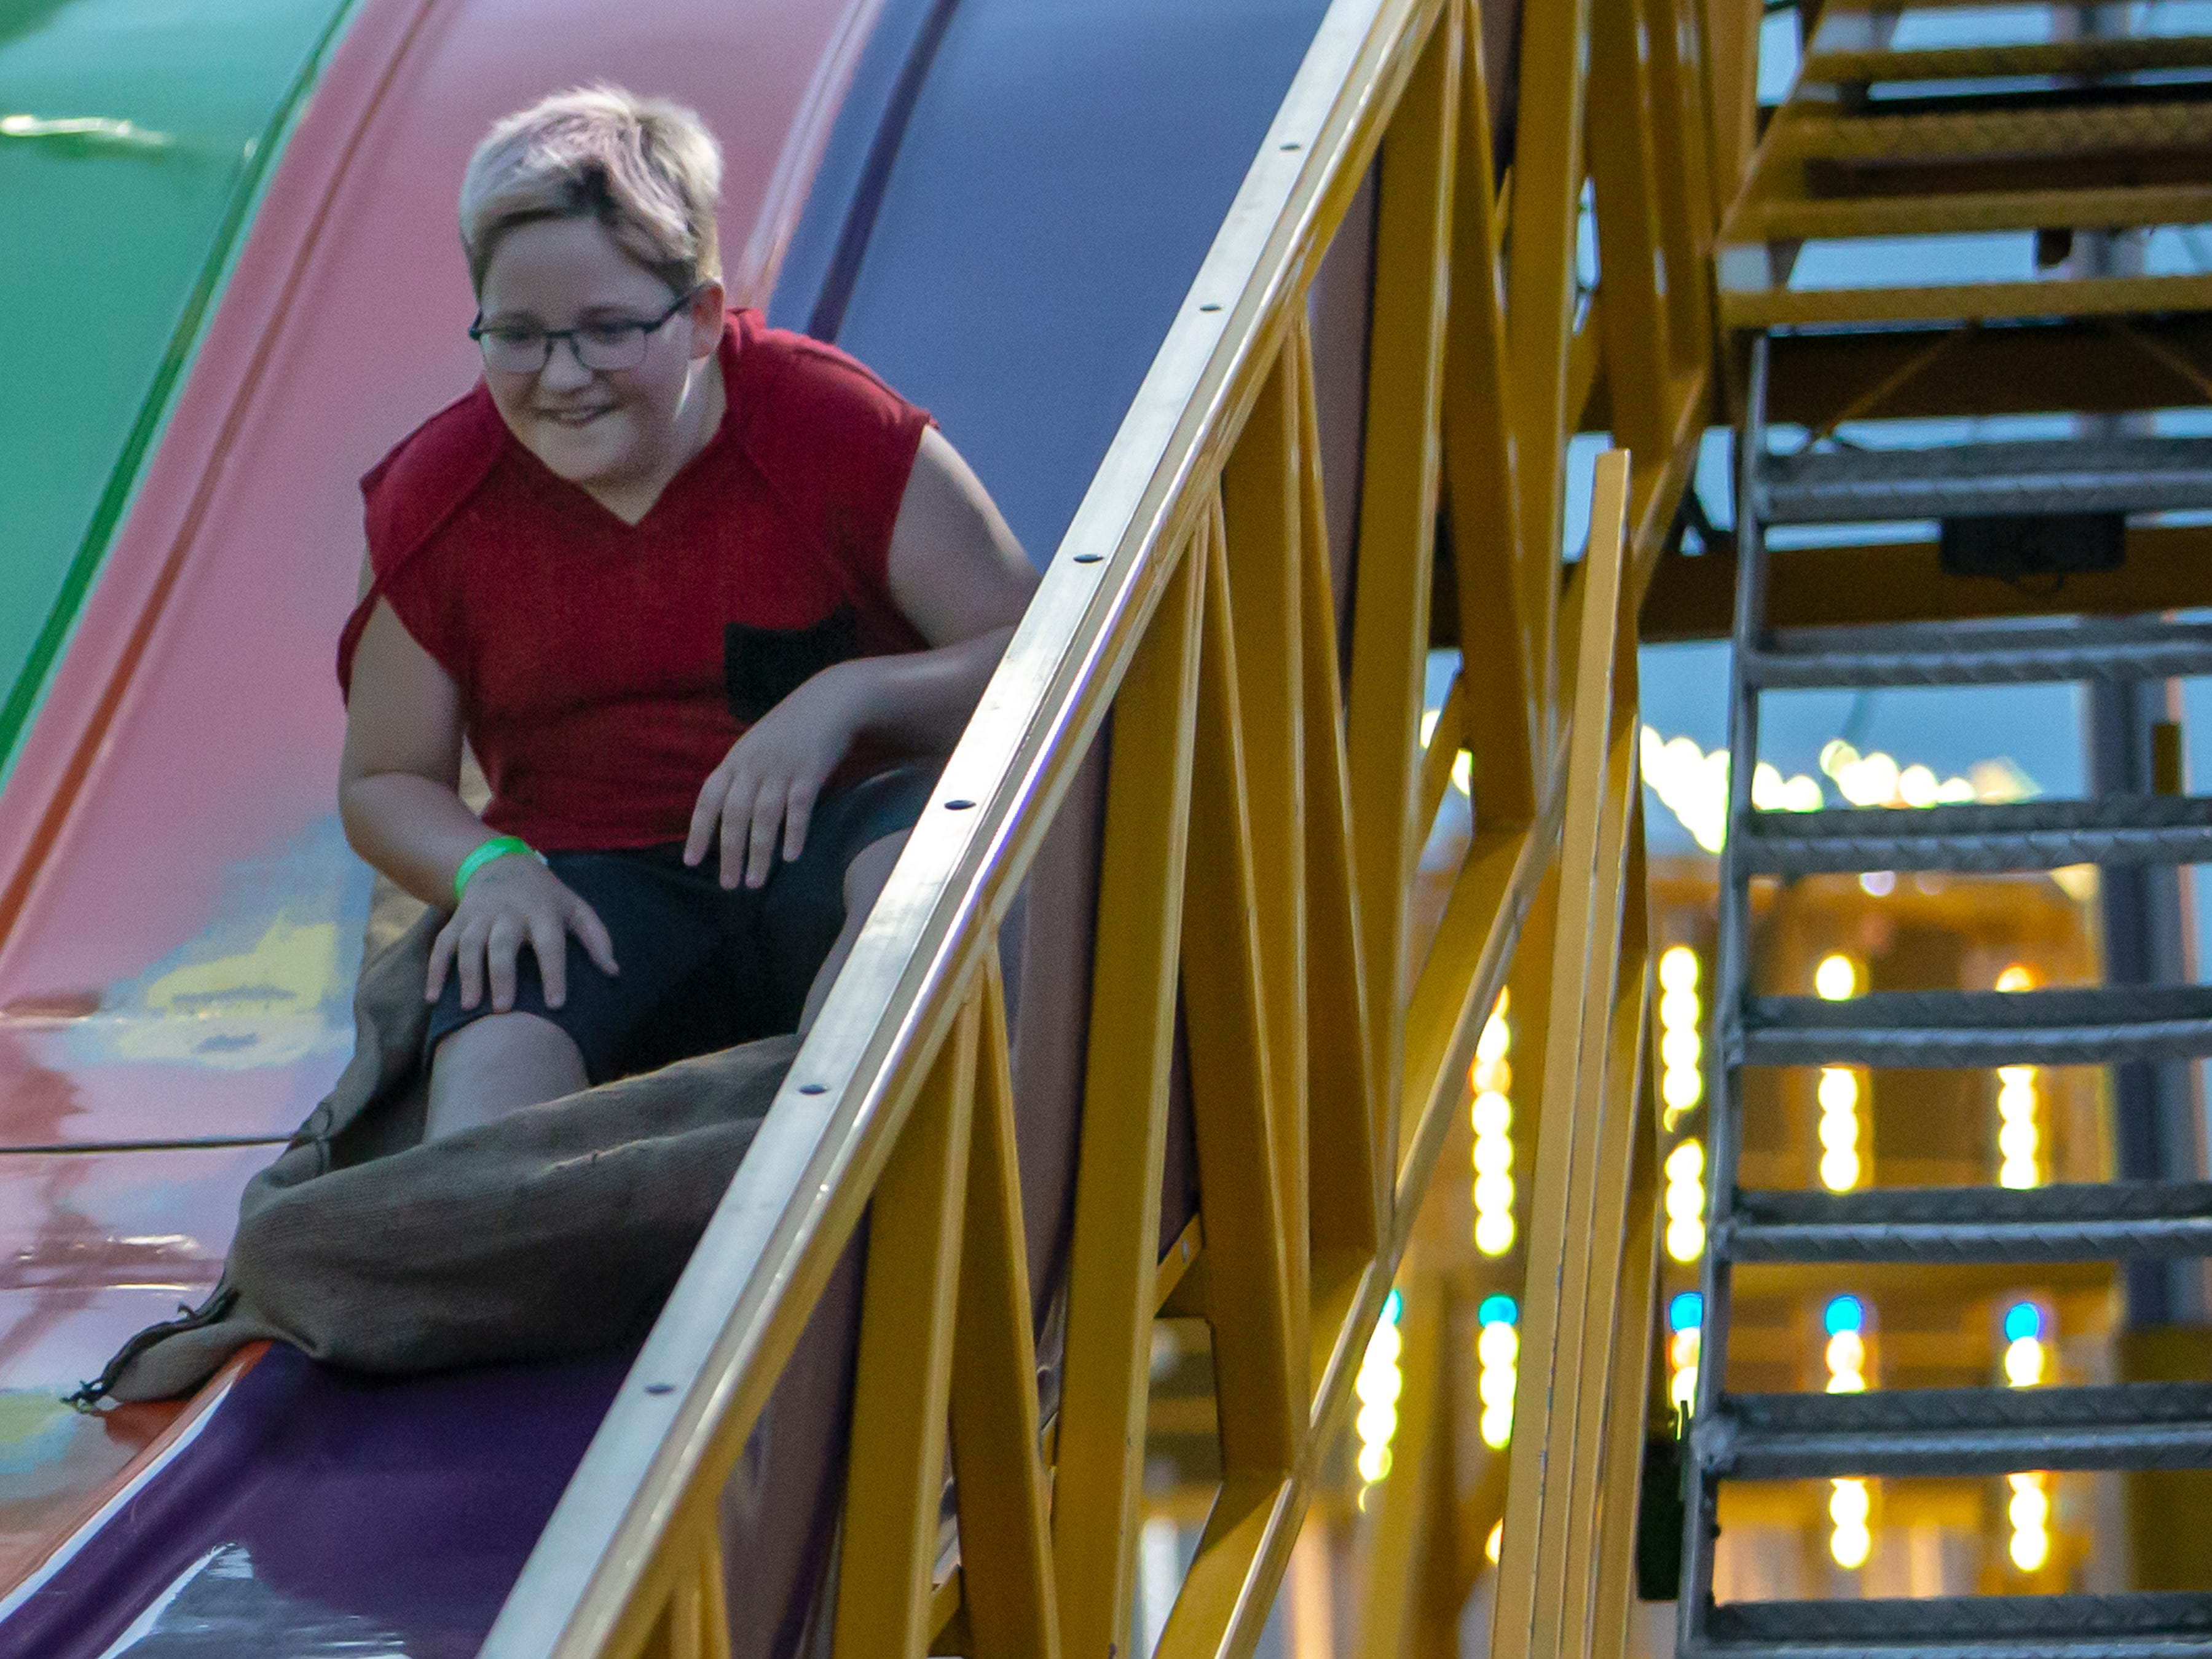 Zander Malson slides down the grant slide during the Winnebago County Fair on Friday, Aug. 3, 2018.